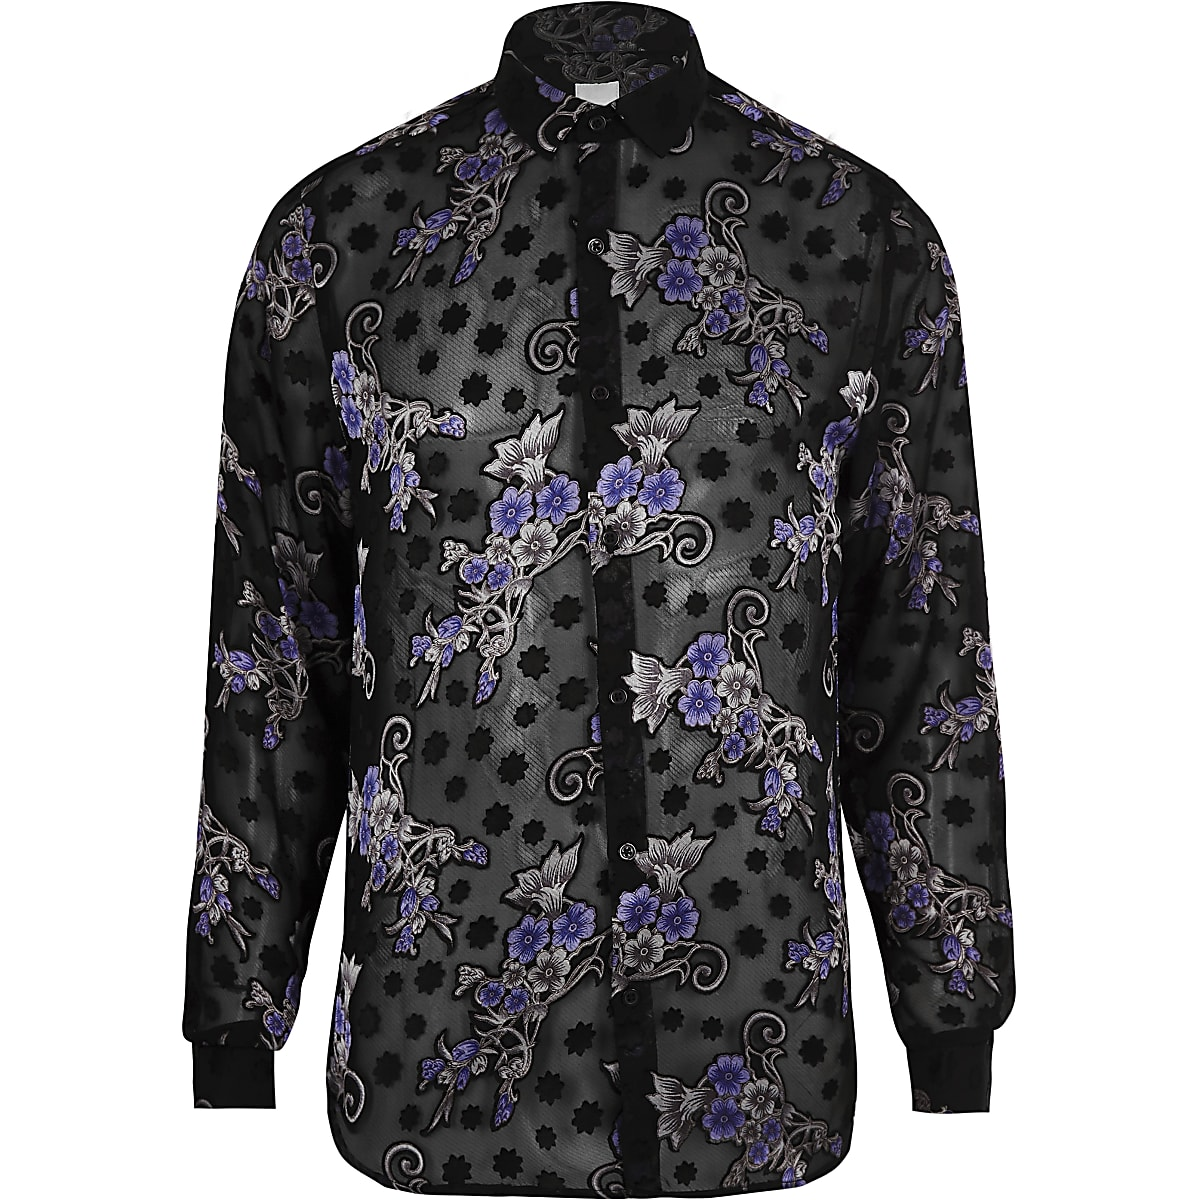 Black floral print long sleeve shirt